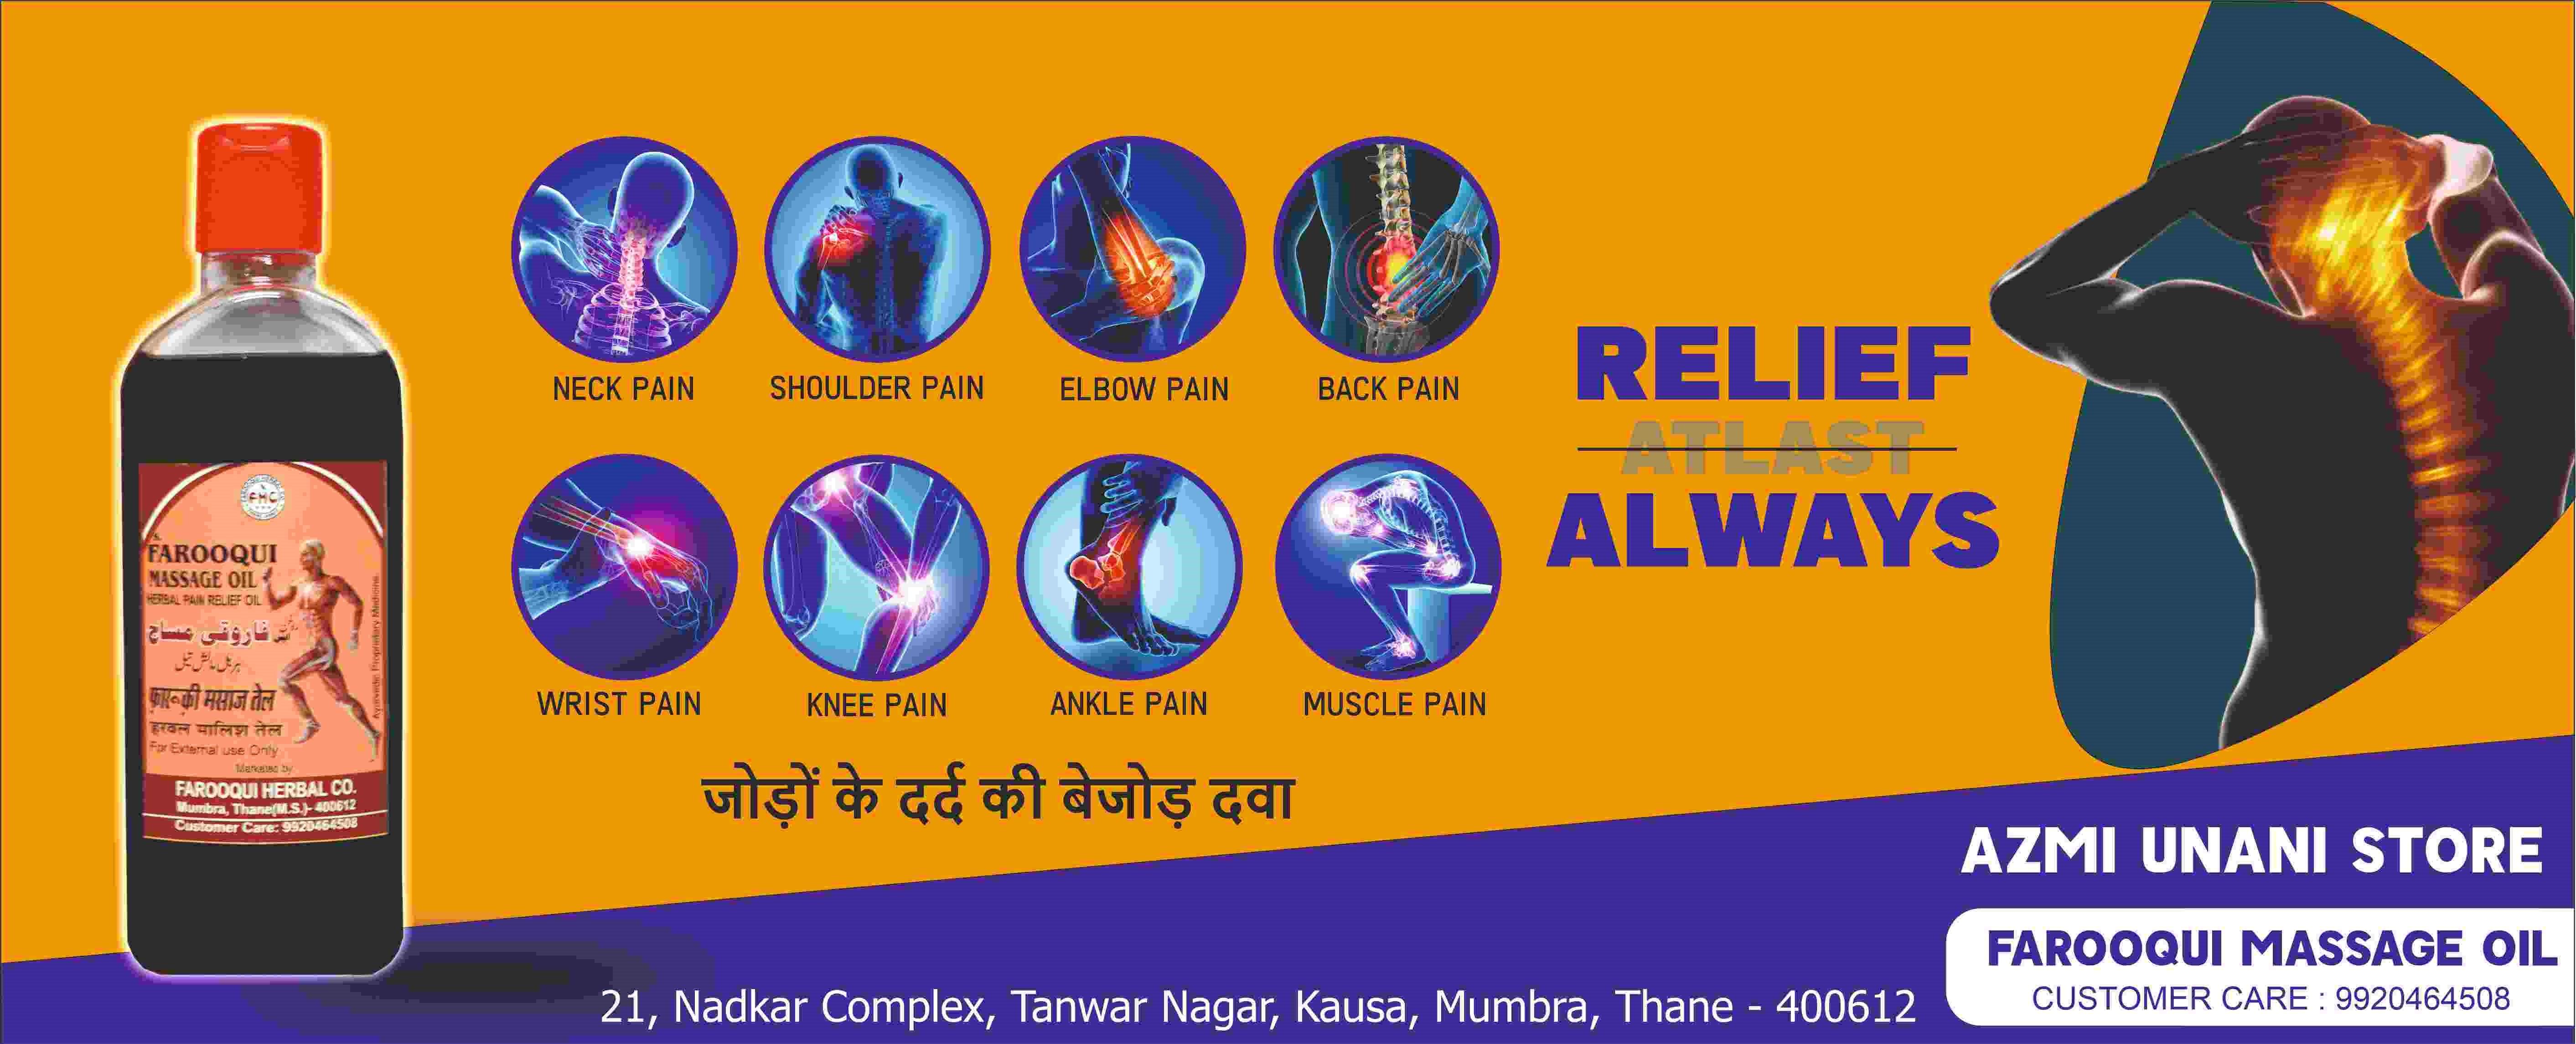 Unani Pharma - Buy Ayurvedic Medicines Online promo